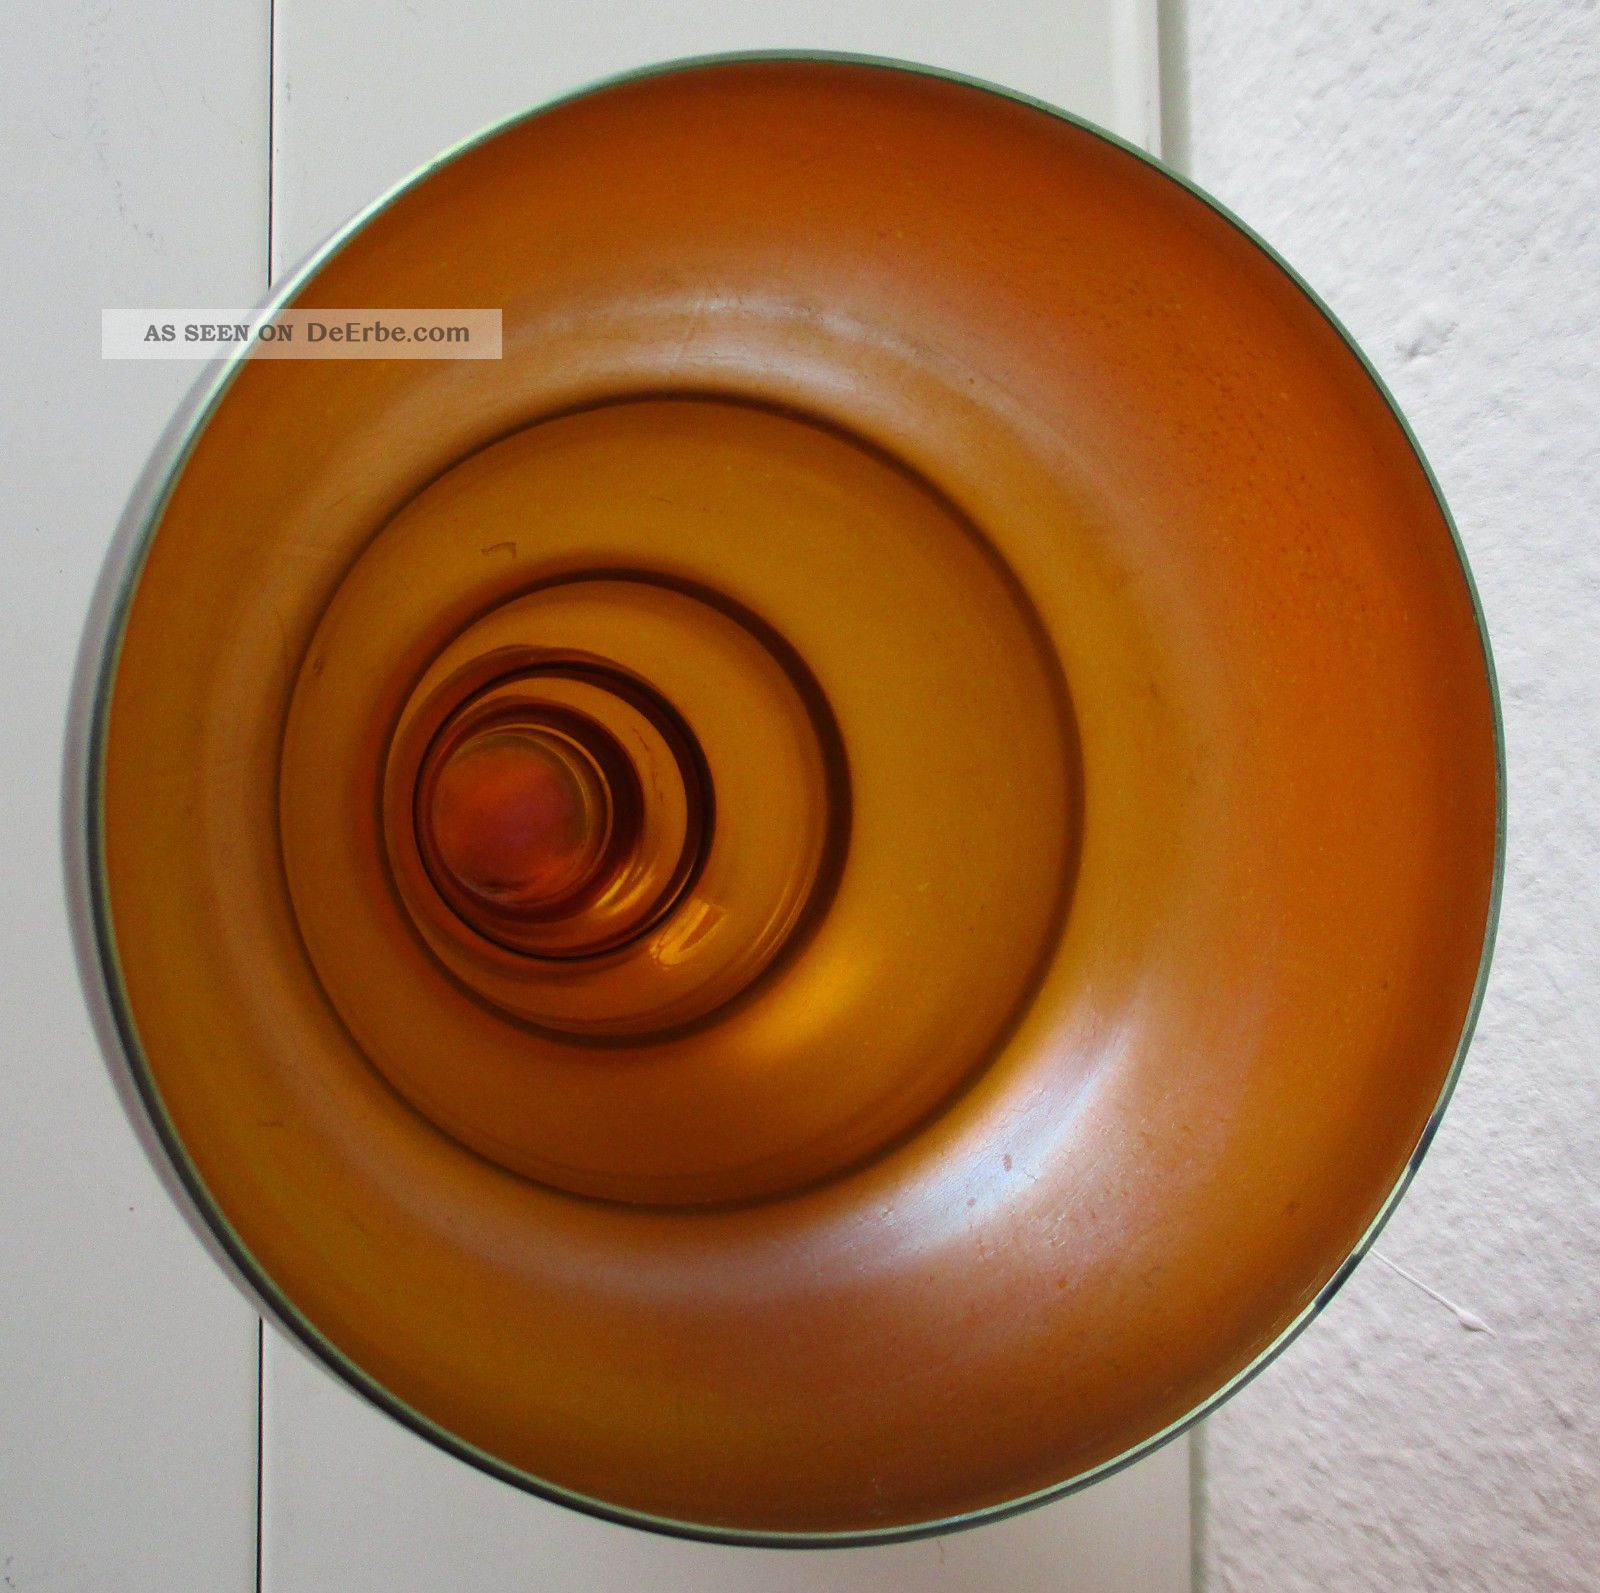 Seltene Gro 223 E Wmf Myra Vase Art Deco Bauhaus Signiert